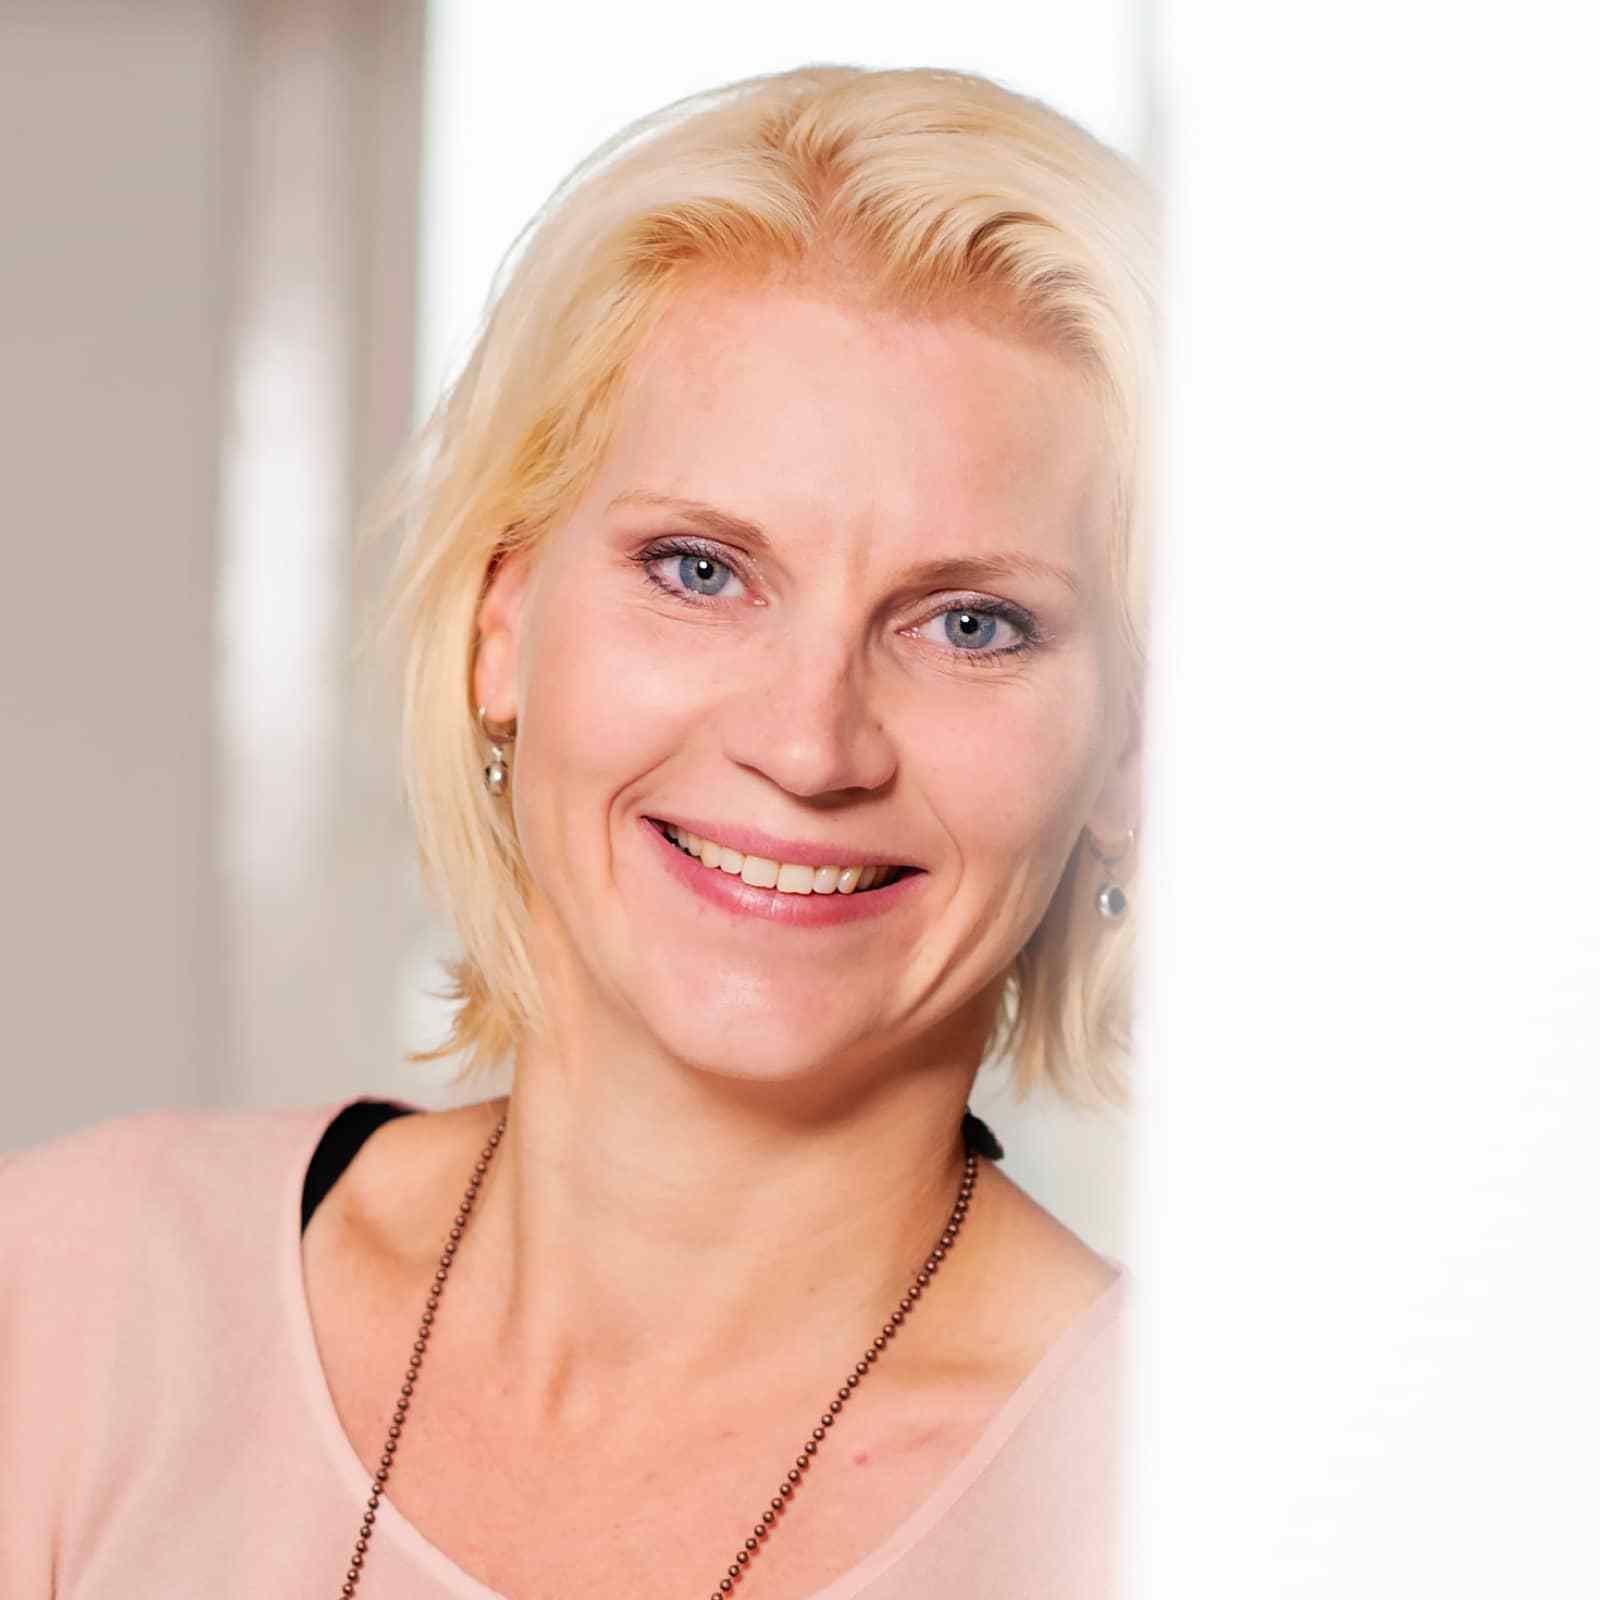 Sabine Vehof - Boekhouder en financiële coach in Emmen